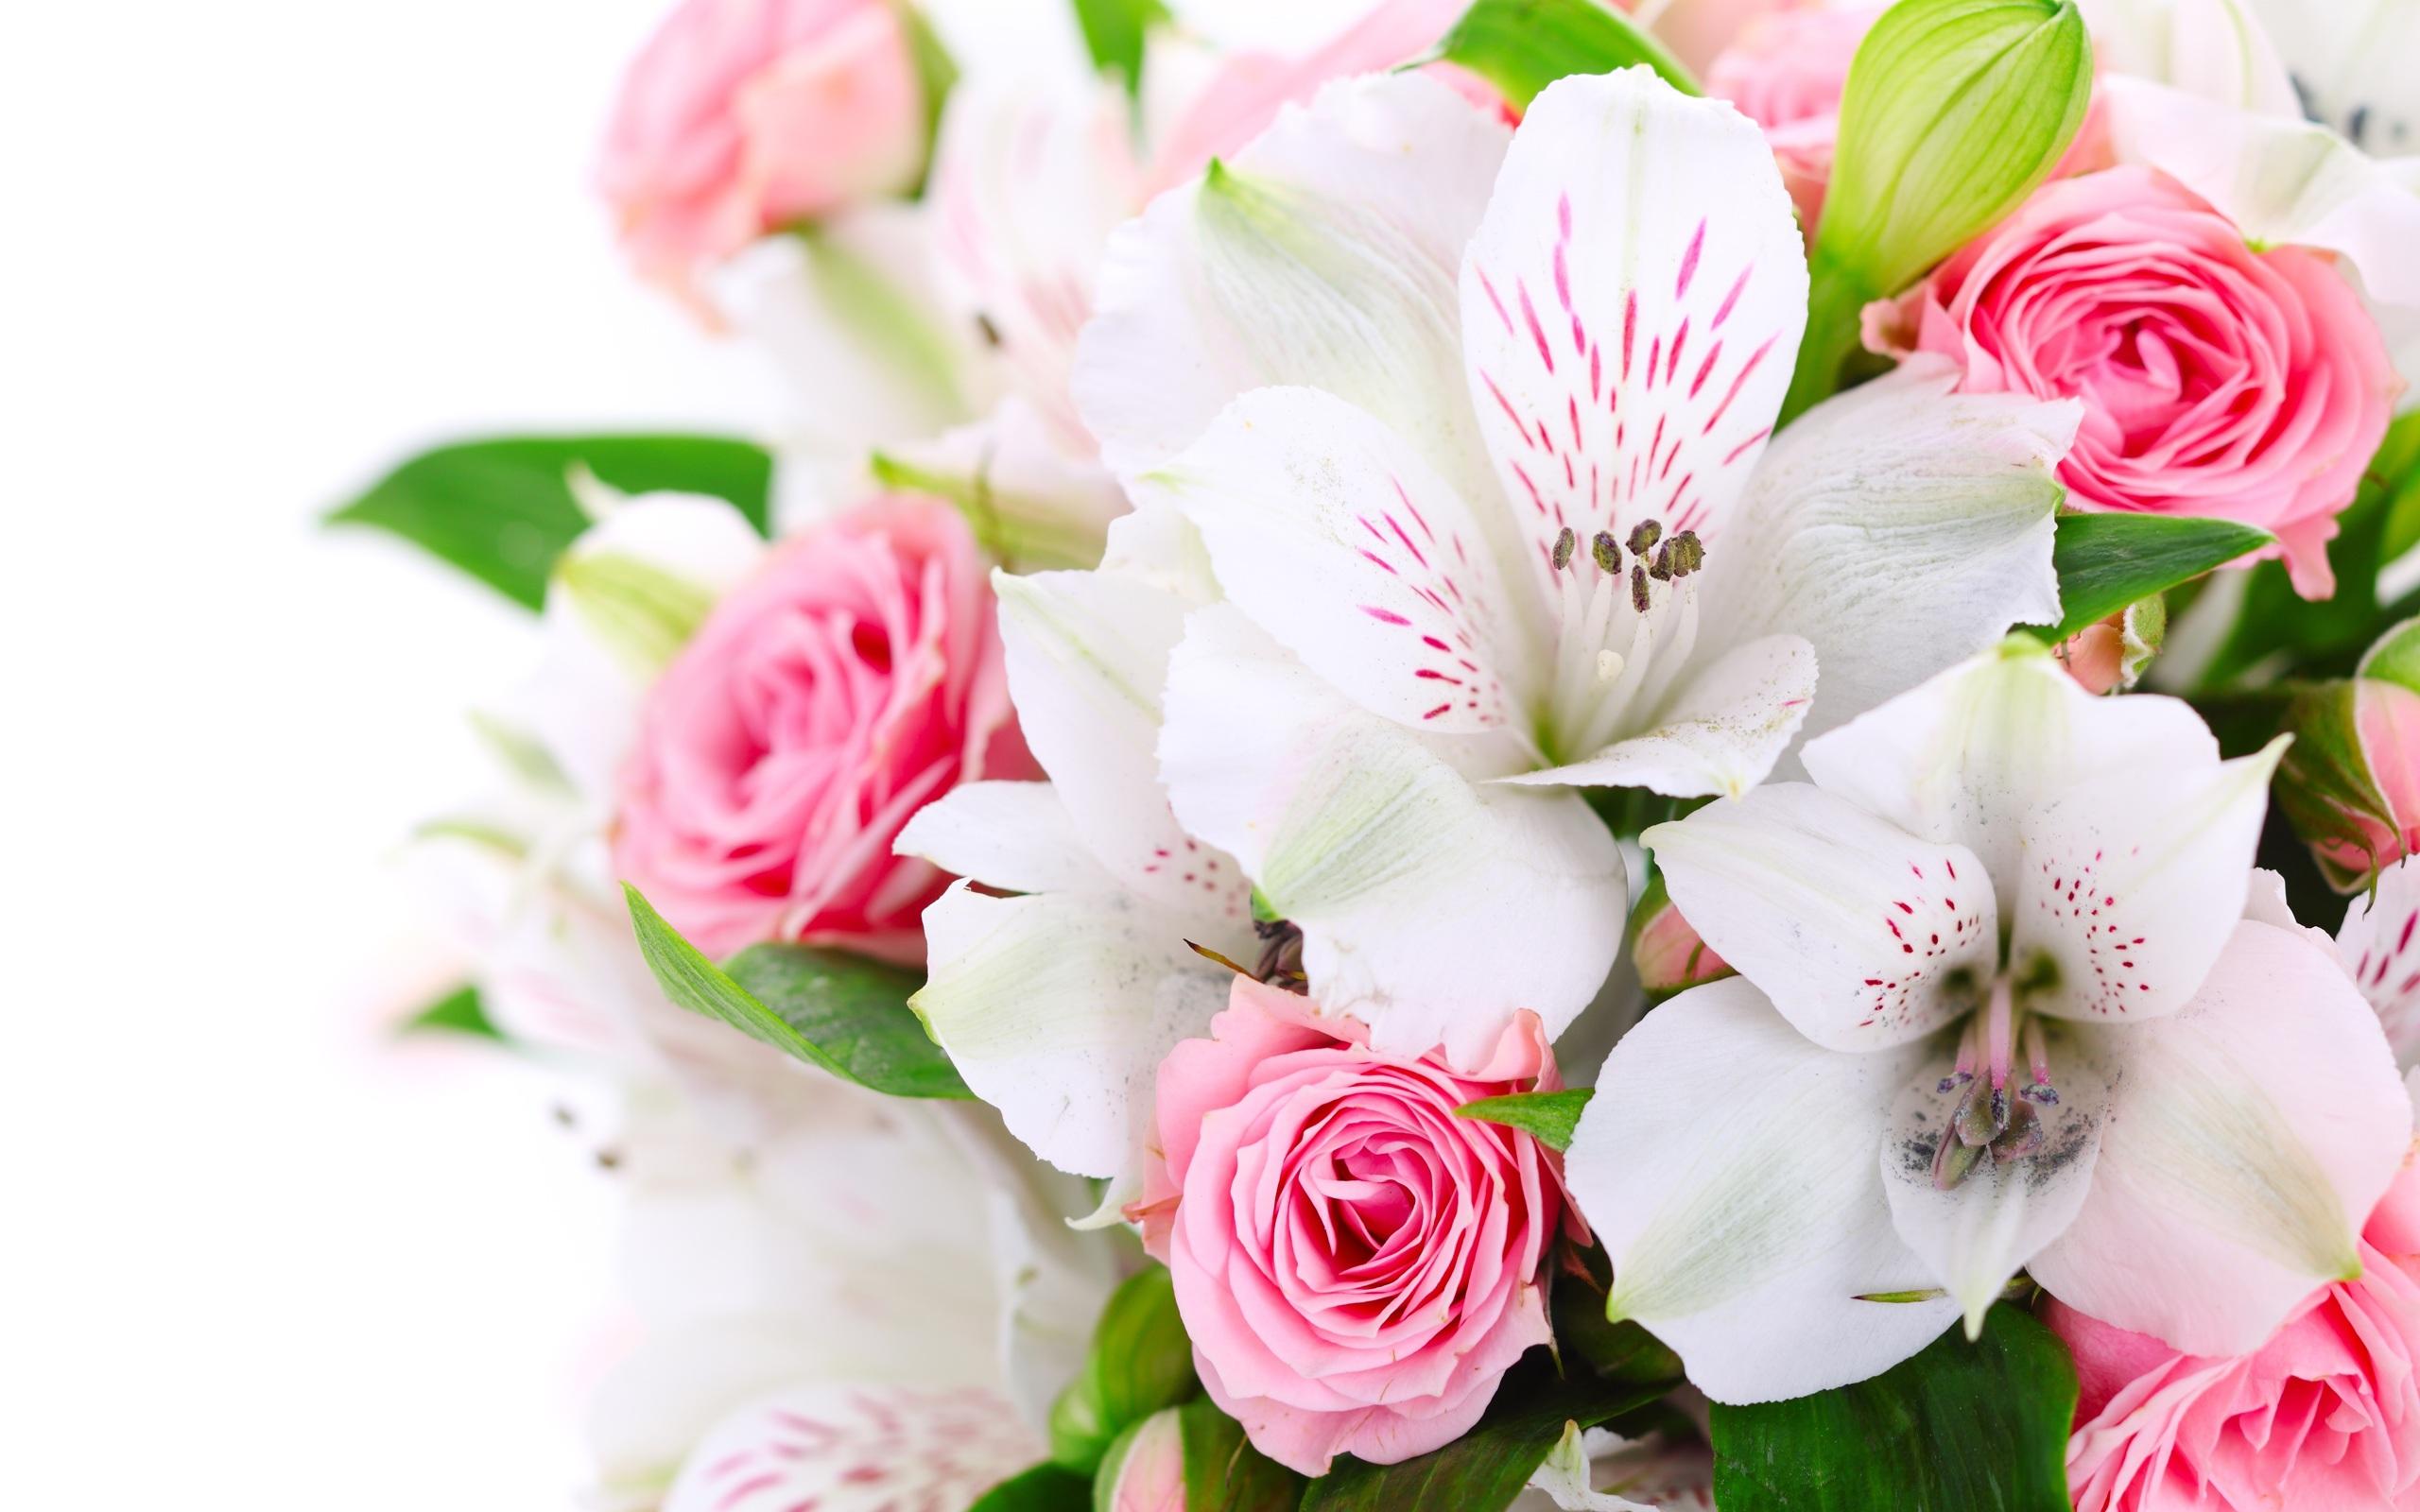 Wallpaper A Bouquet Flowers Pink Roses